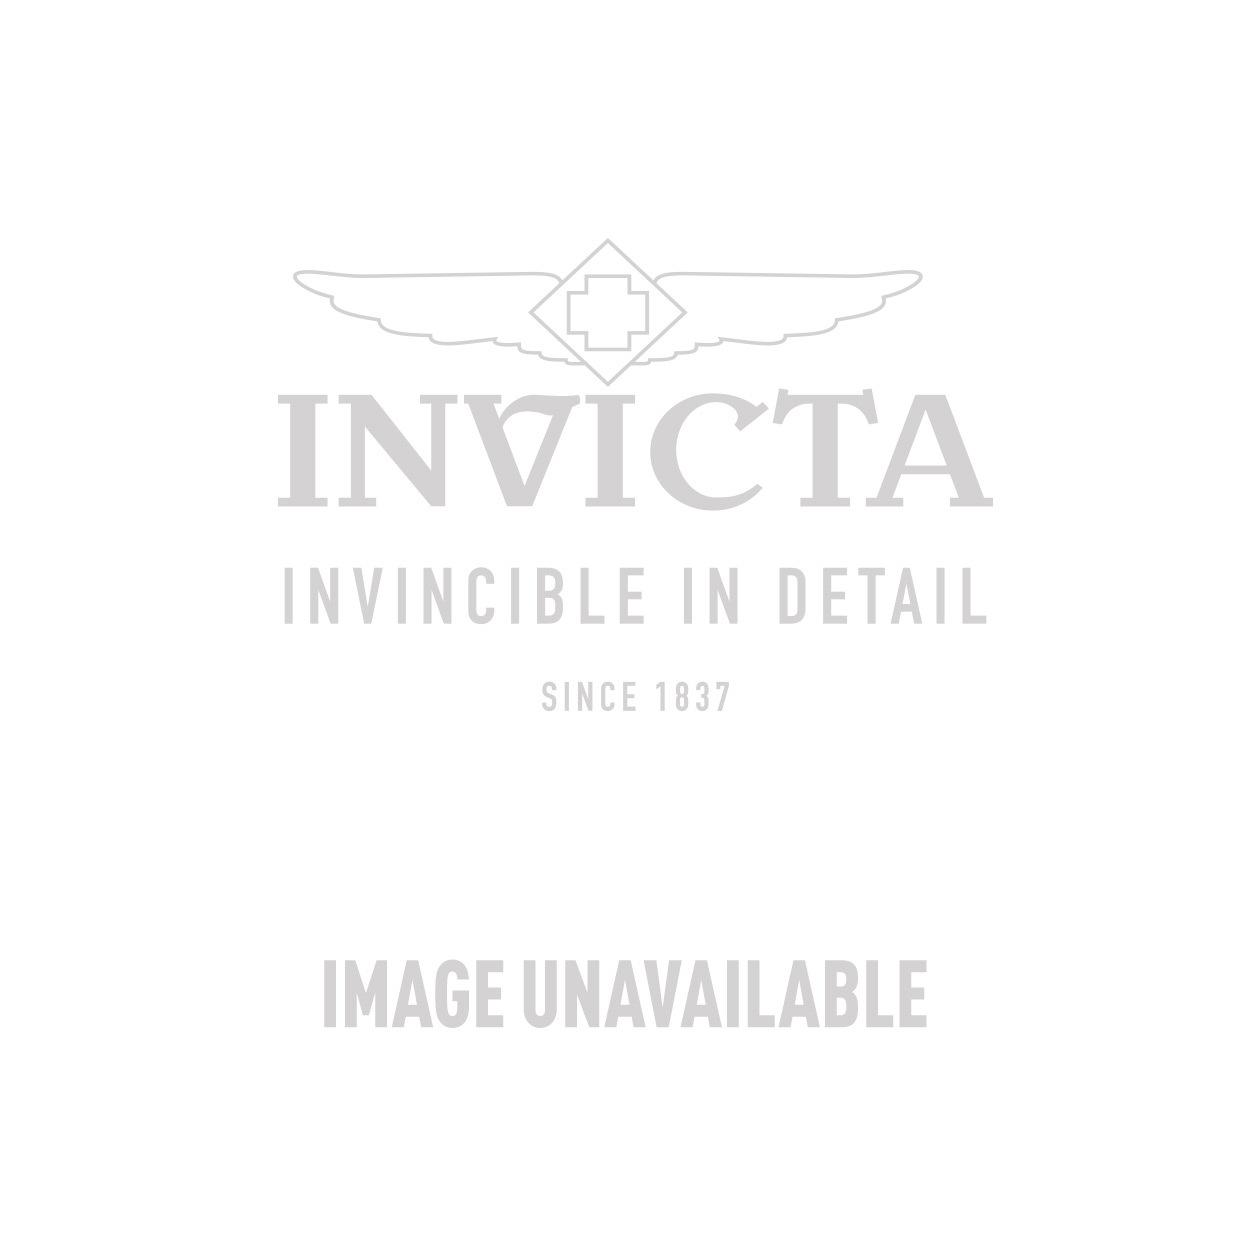 Invicta Corduba Swiss Movement Quartz Watch - Black case with Black, Red tone Stainless Steel, Polyurethane band - Model 6680